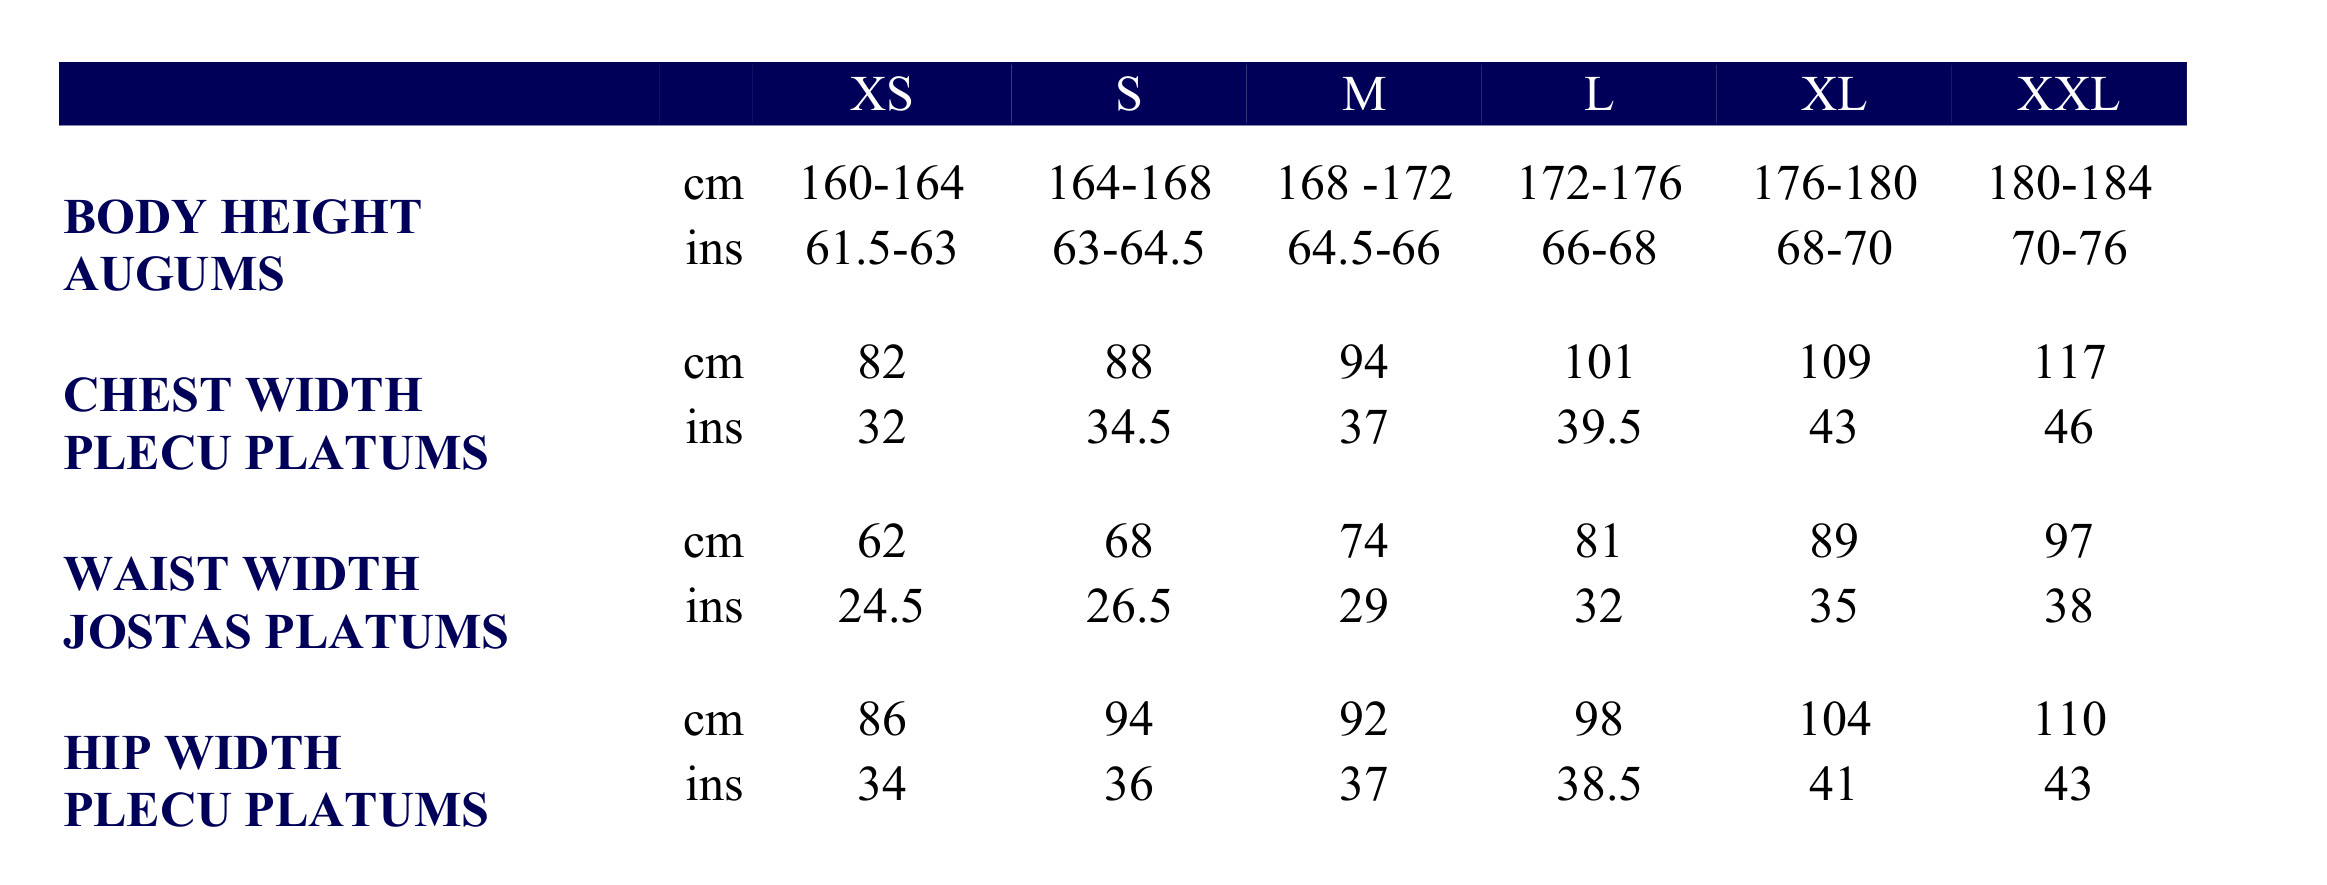 Asics Women's clothing size chart